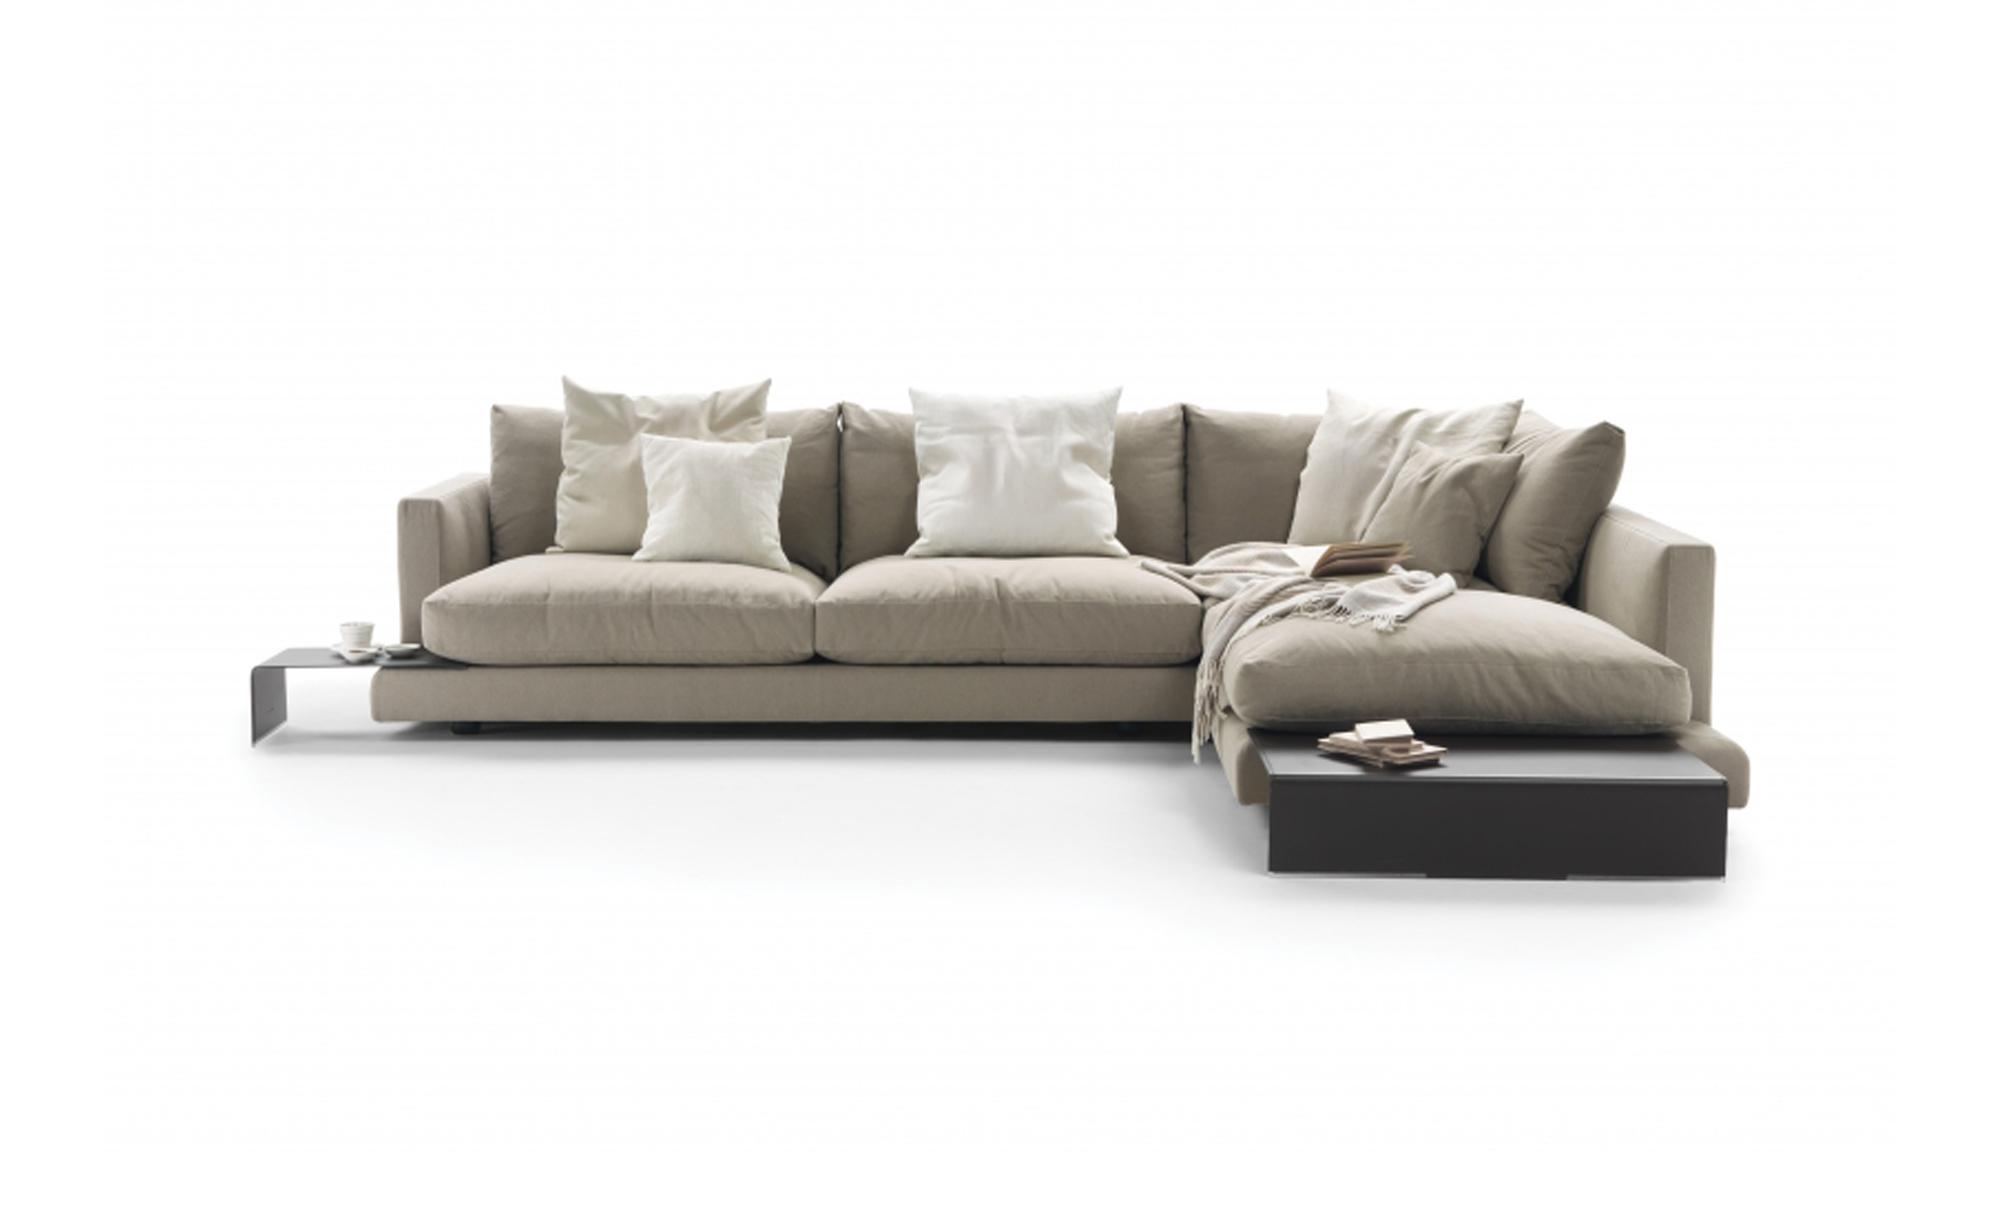 Long island sofas fanuli furniture - Living room furniture long island ...